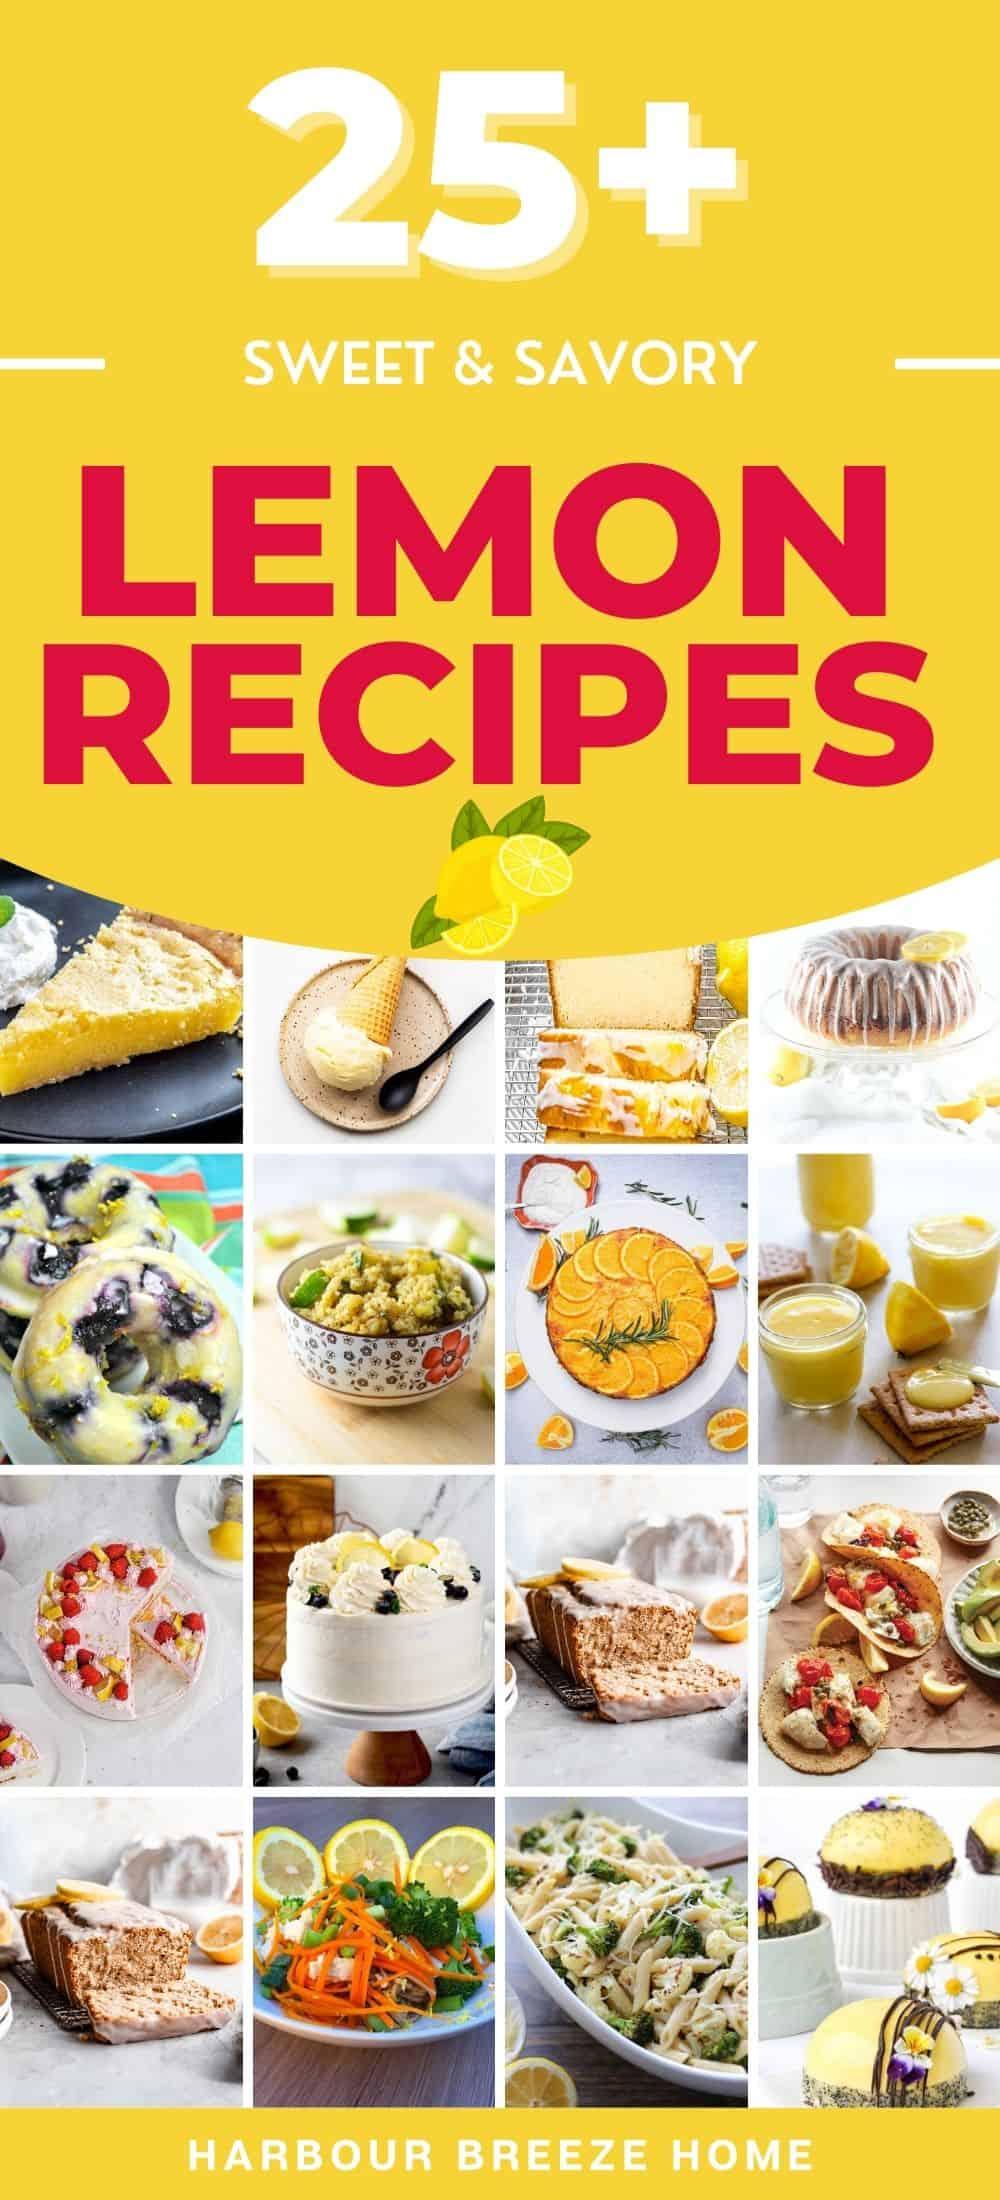 Sweet & Savory Lemon Recipe Ideas